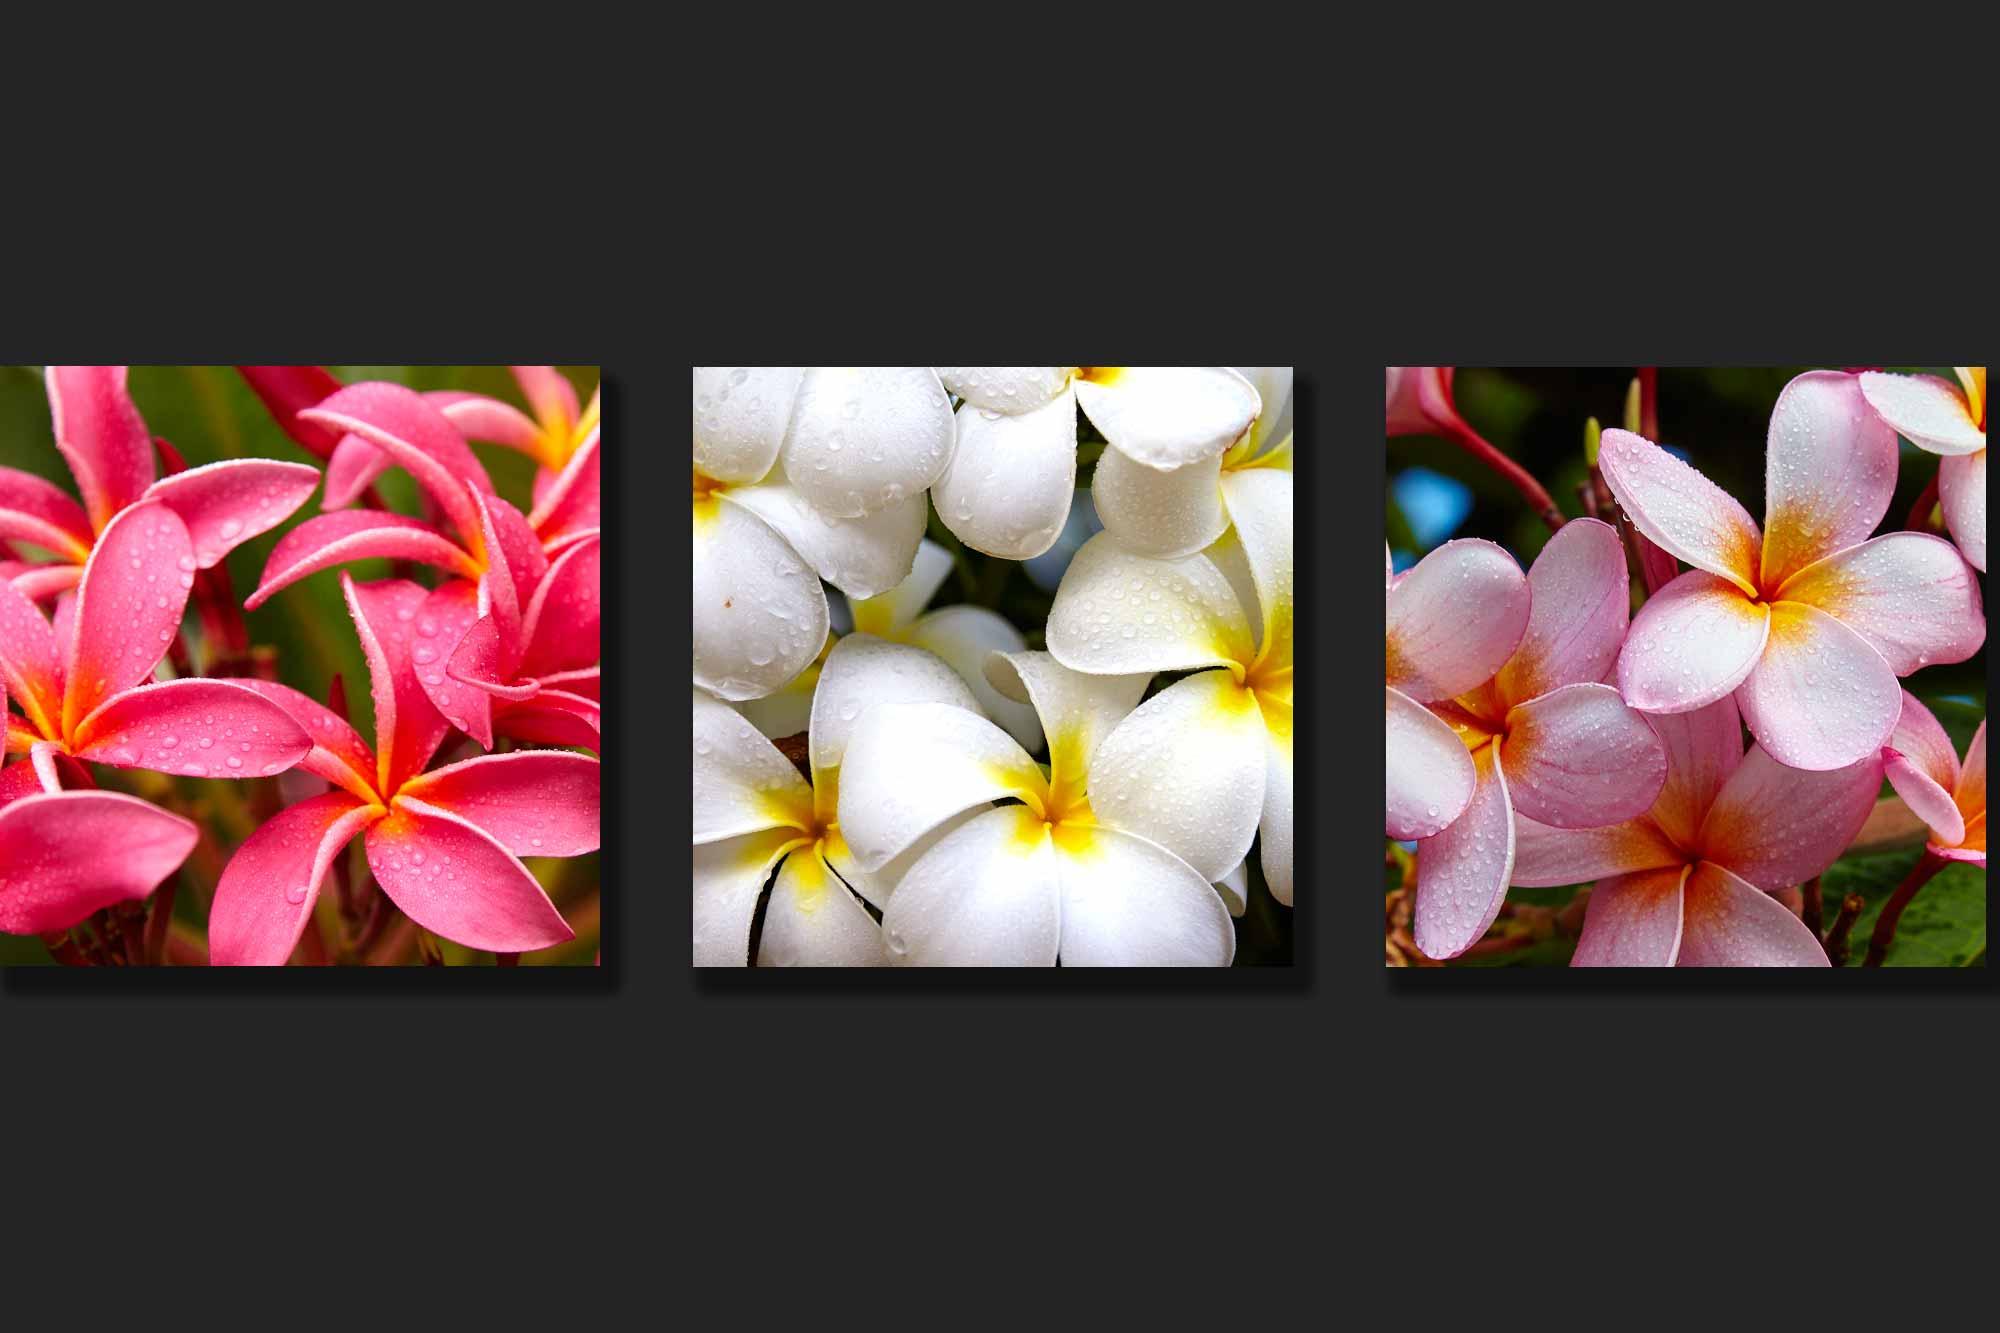 Plumeria flowers Hawaiian blossoms honolulu high definition HD professional landscape photography